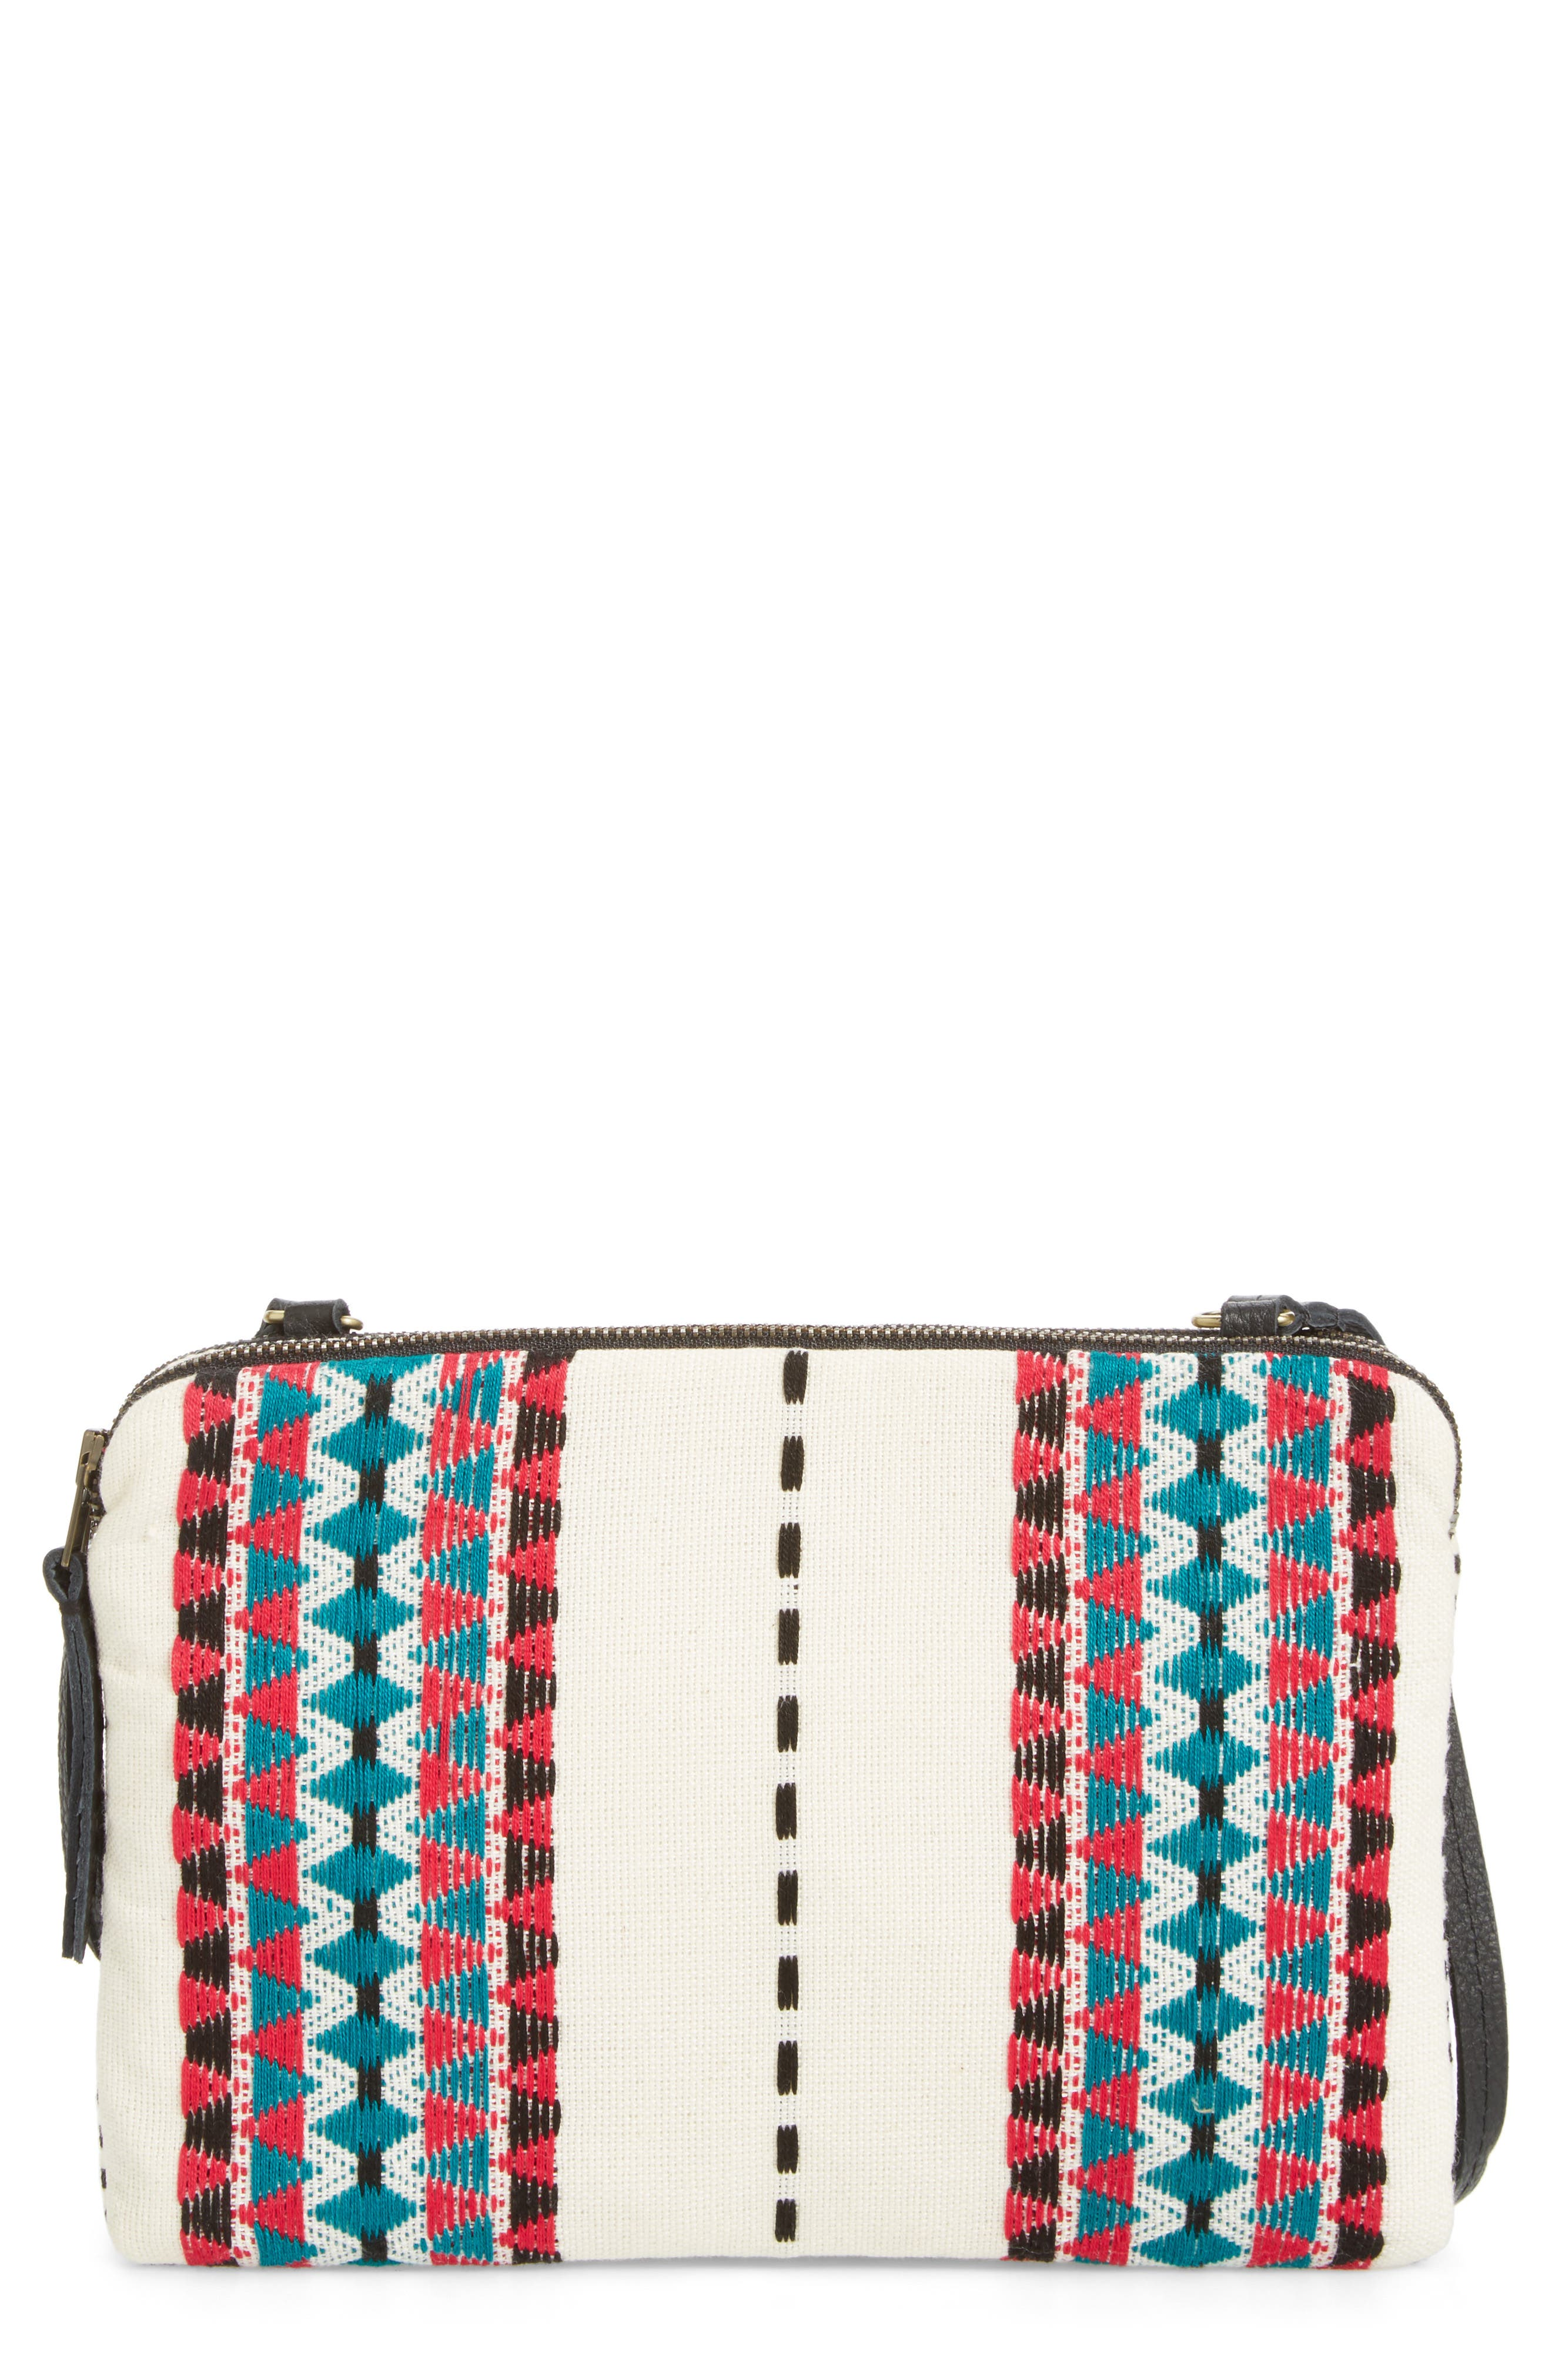 MERCADO GLOBAL Andrea Canvas Crossbody Bag